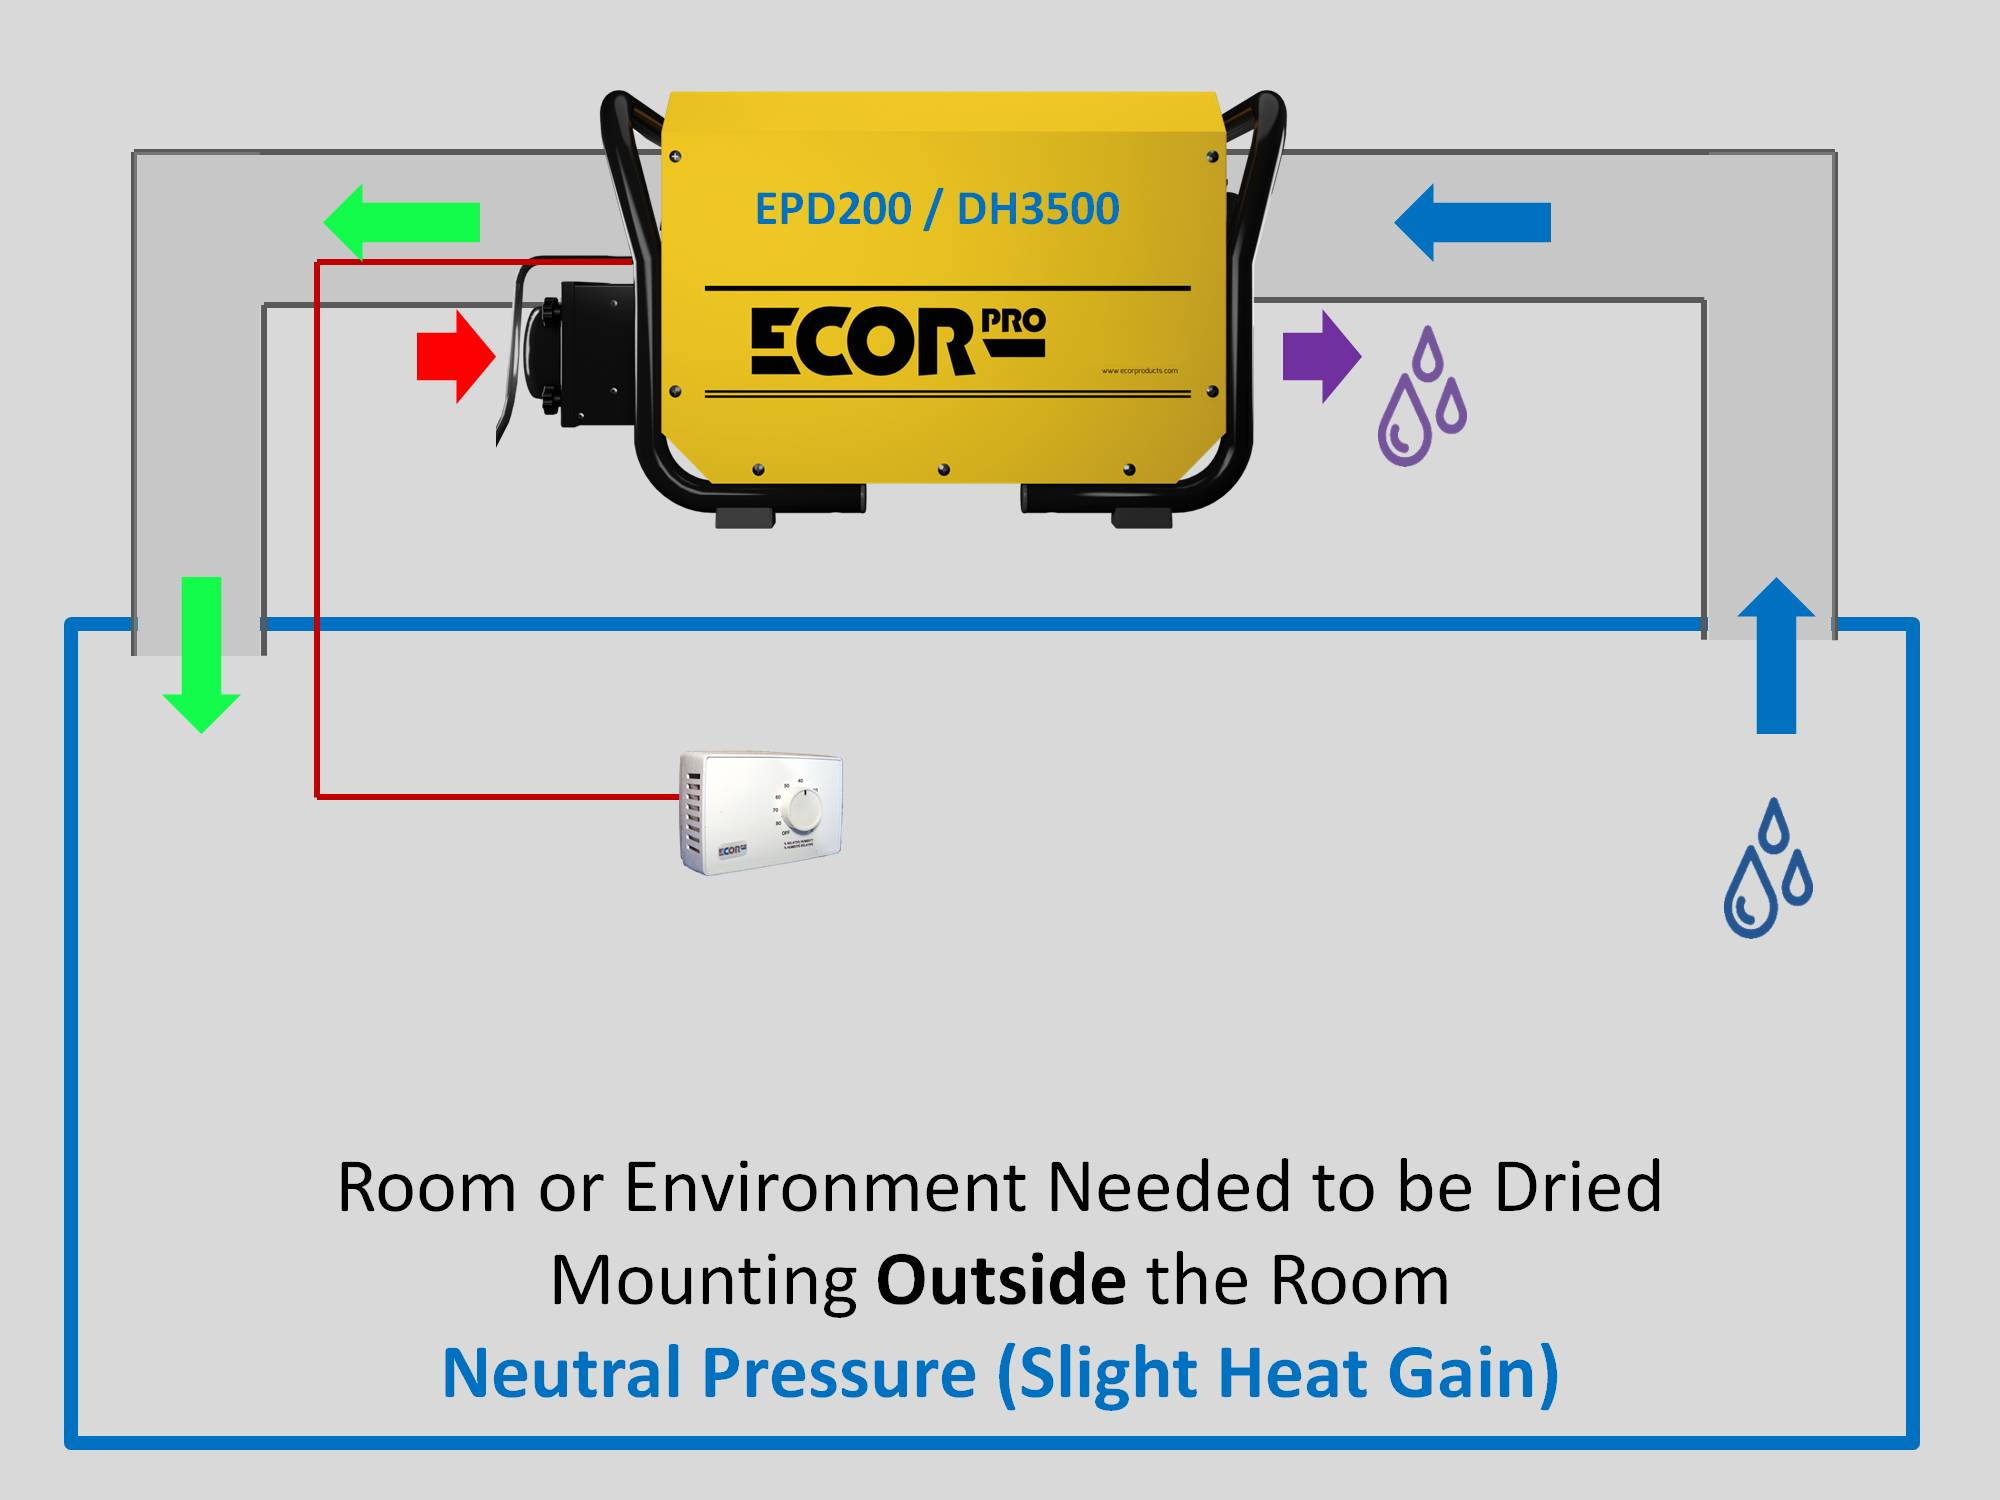 EPD200 EDH3500 dehumidifiers by Ecor Pro